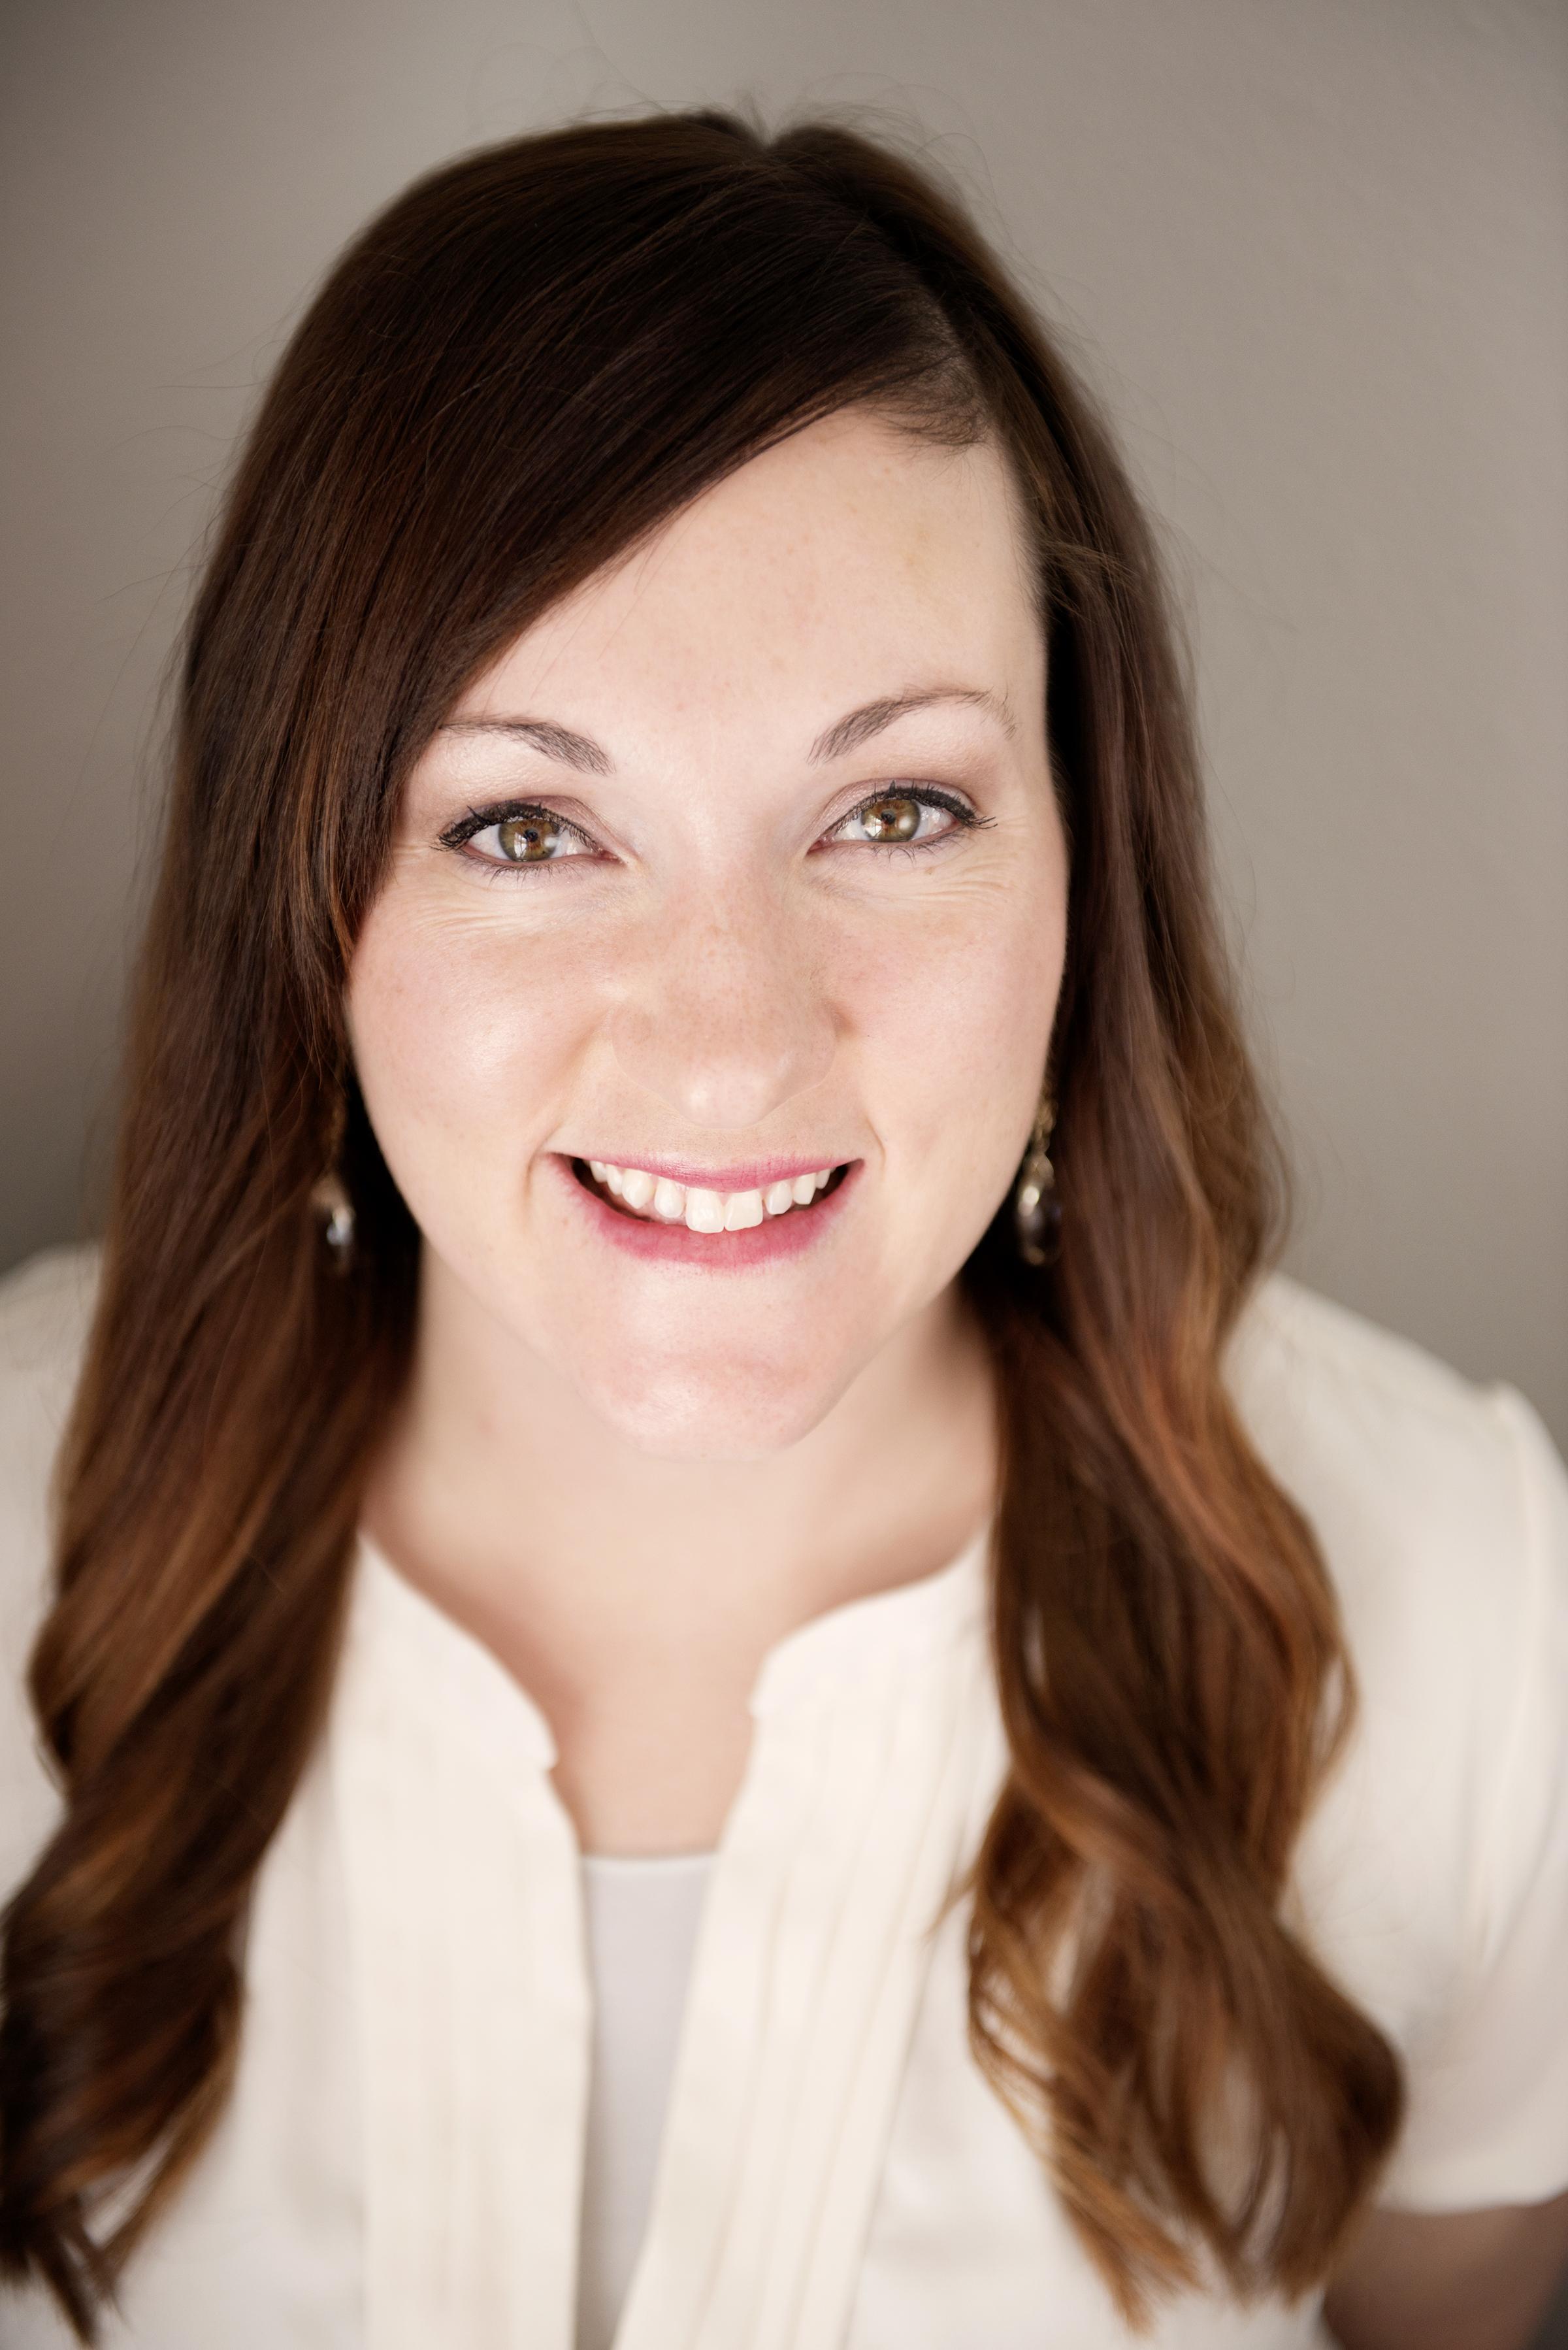 Rodan & Fields Independent Consultant - Beka Hamilton -  www.rhamilton1.myrandf.com